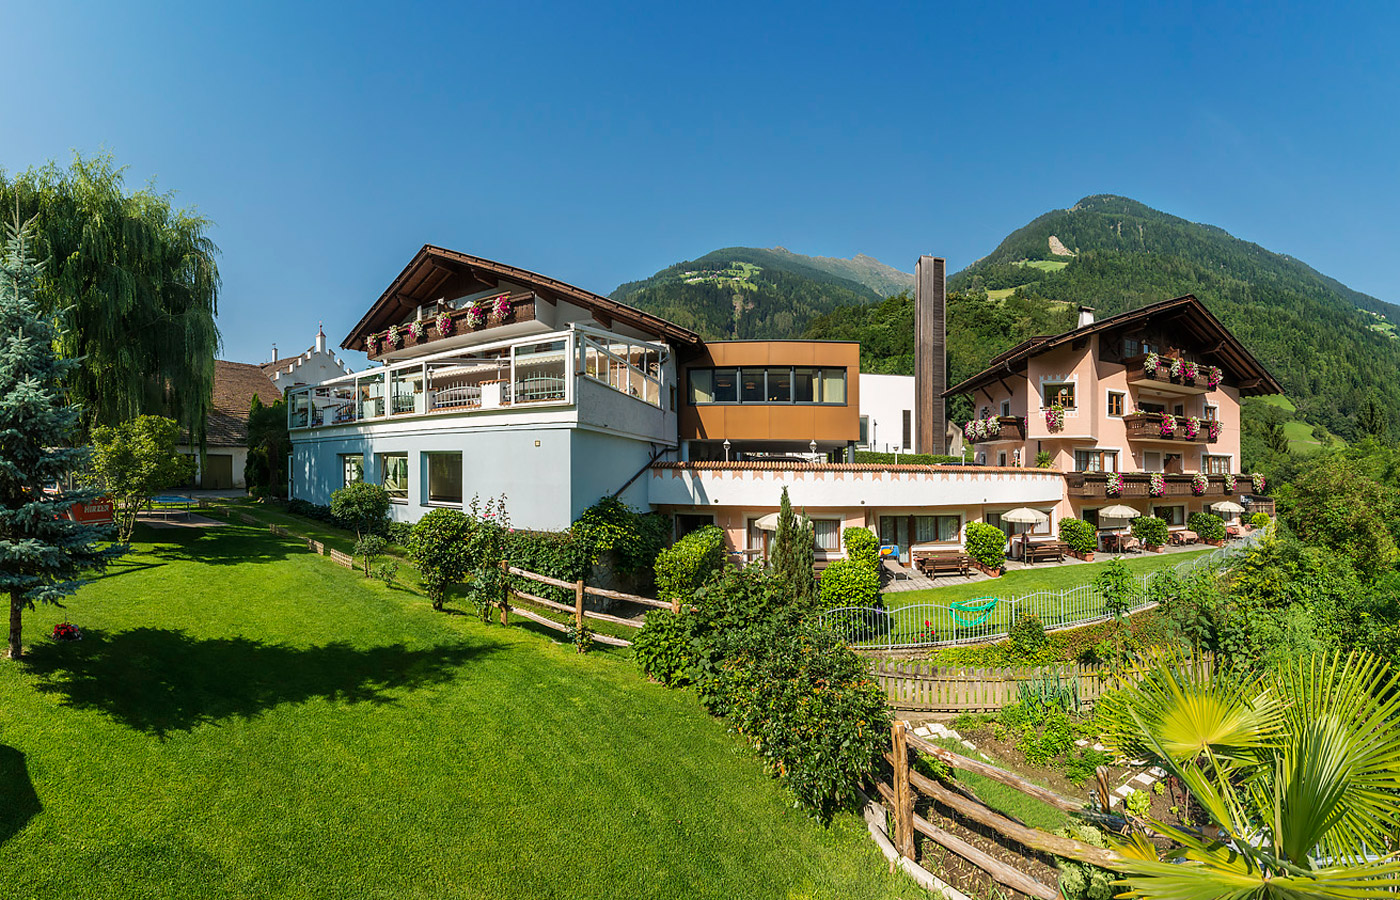 B&B Alpenhof Lodge